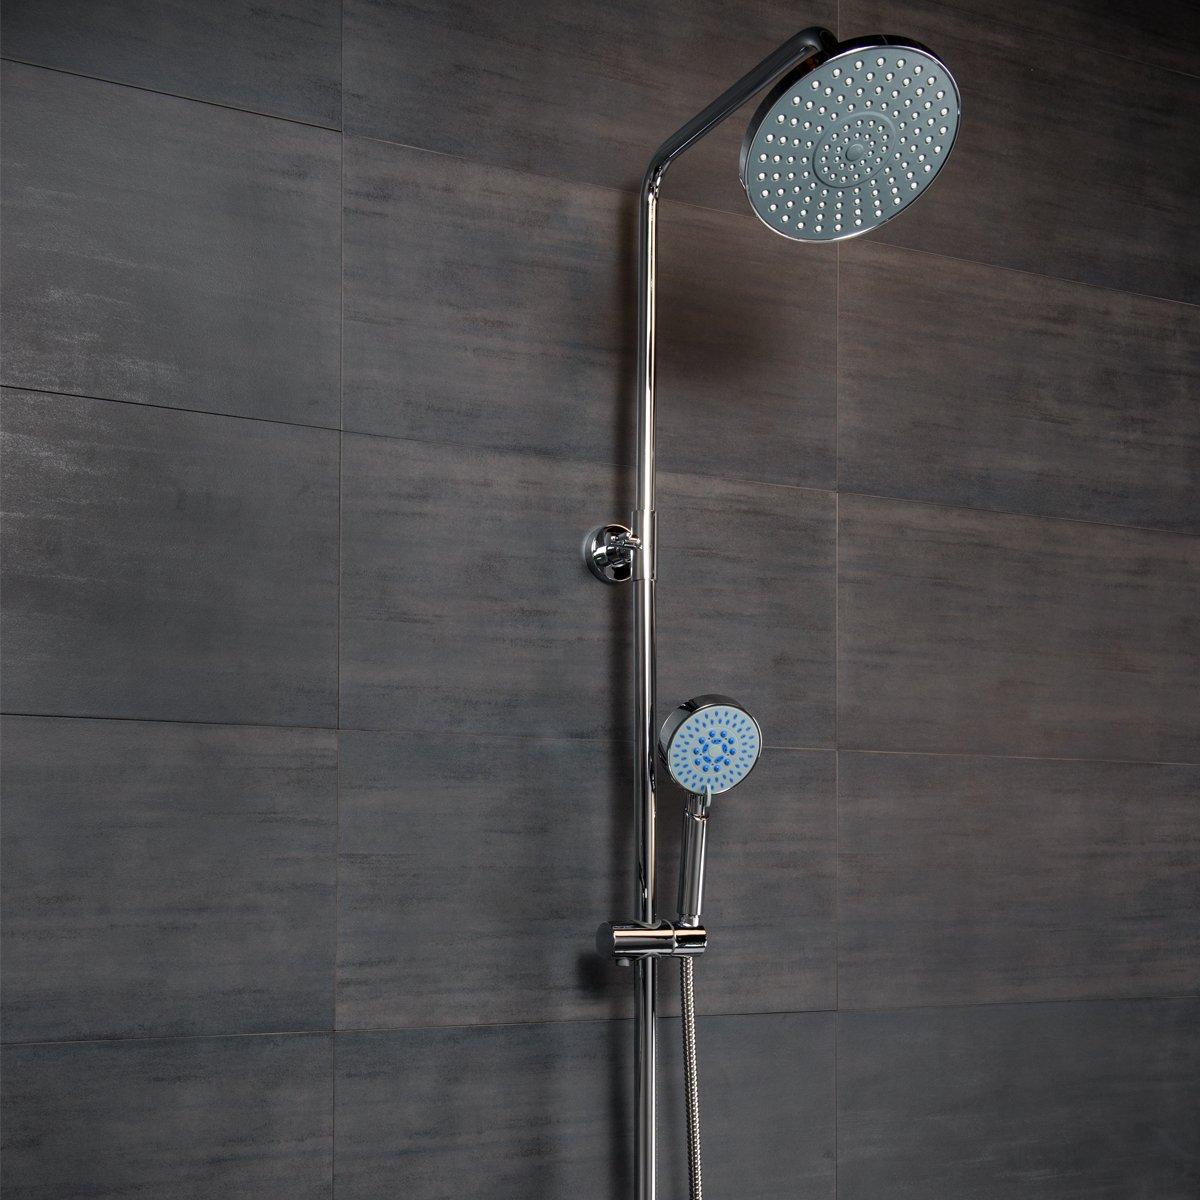 W@sh Thermostatic Twin Head Shower Mixer Reviews | Bathroom Takeaway ...